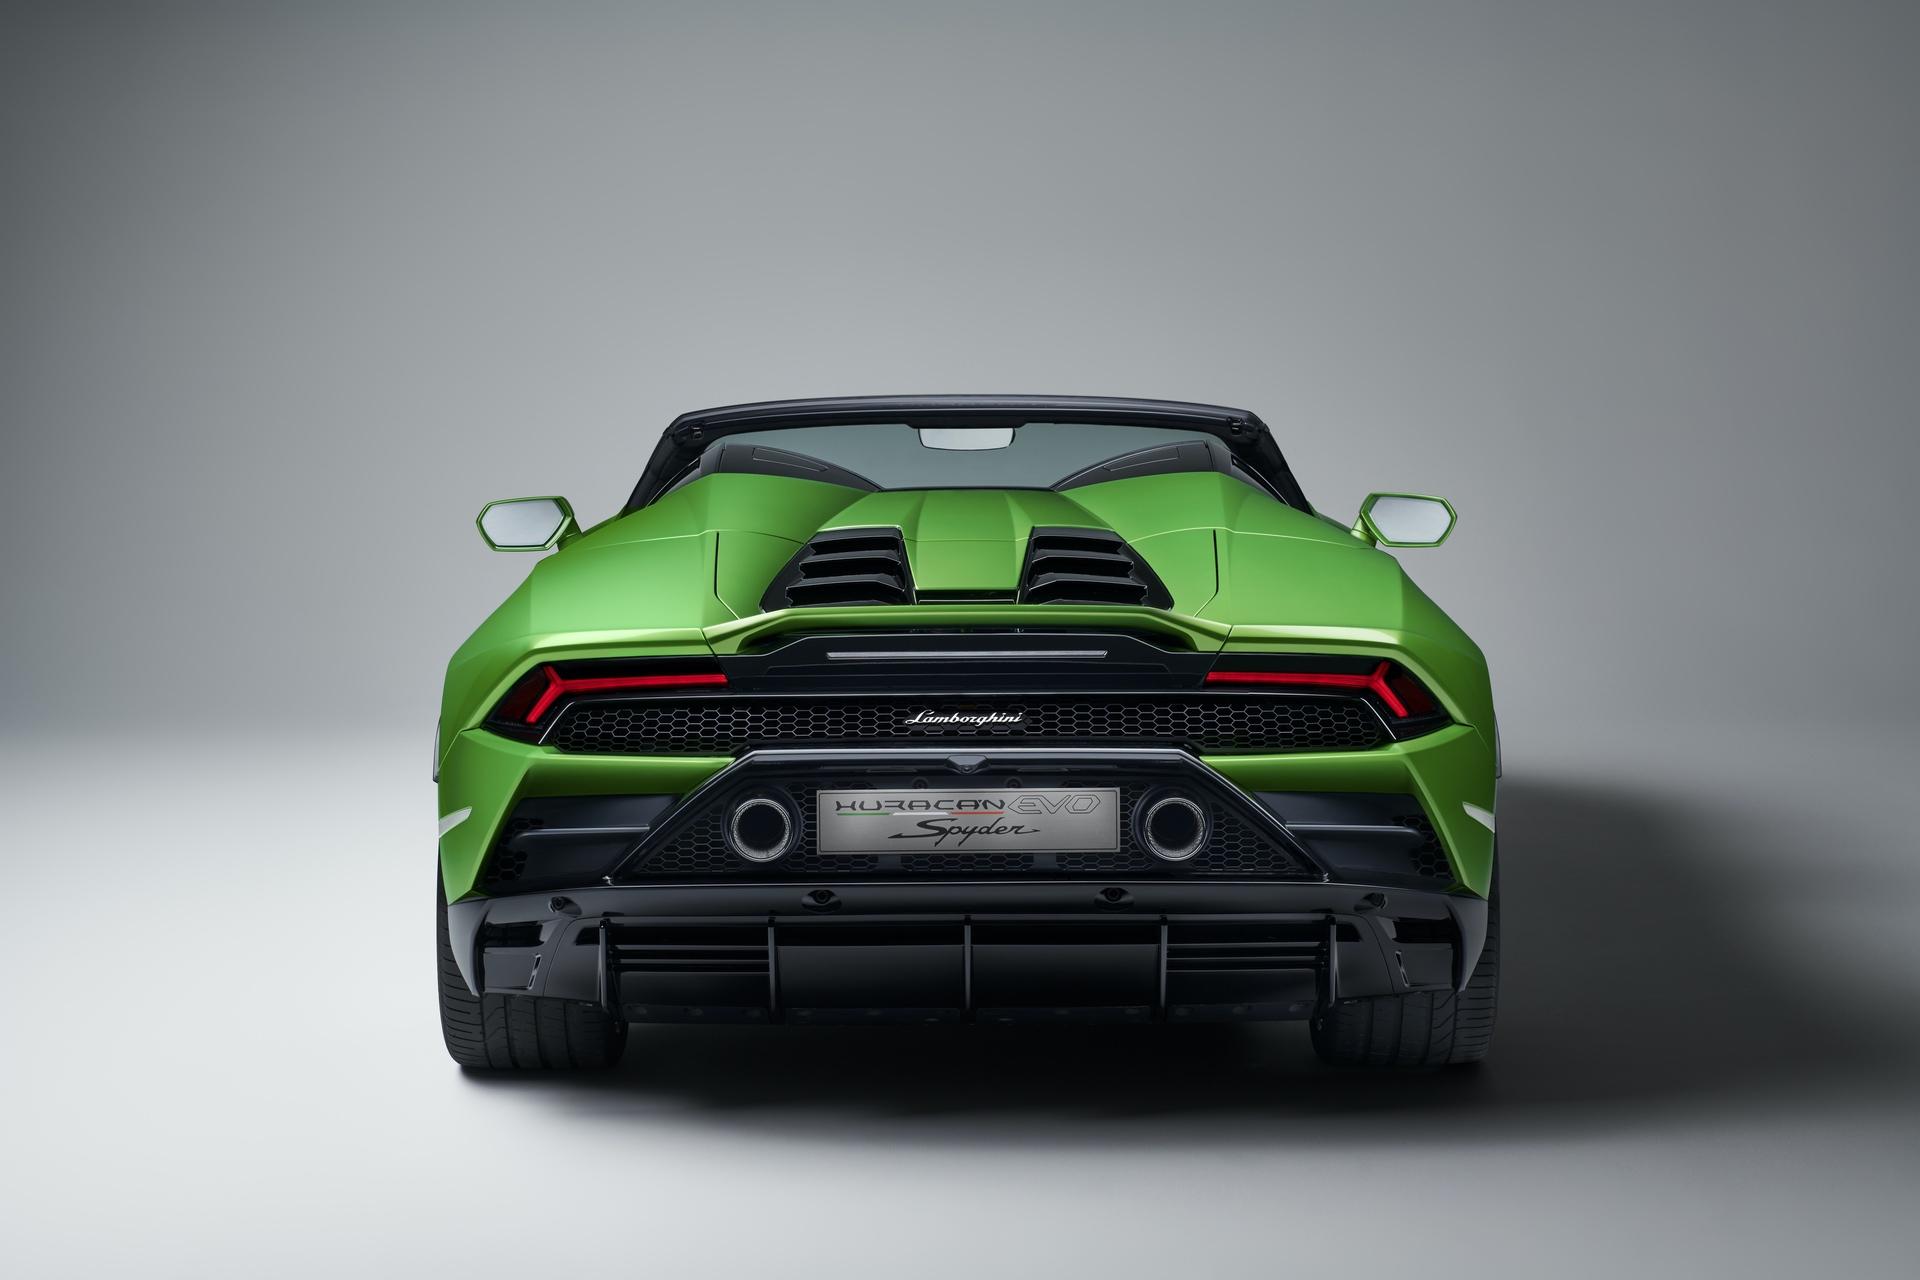 Lamborghini_Huracan_Evo_Spyder_0023